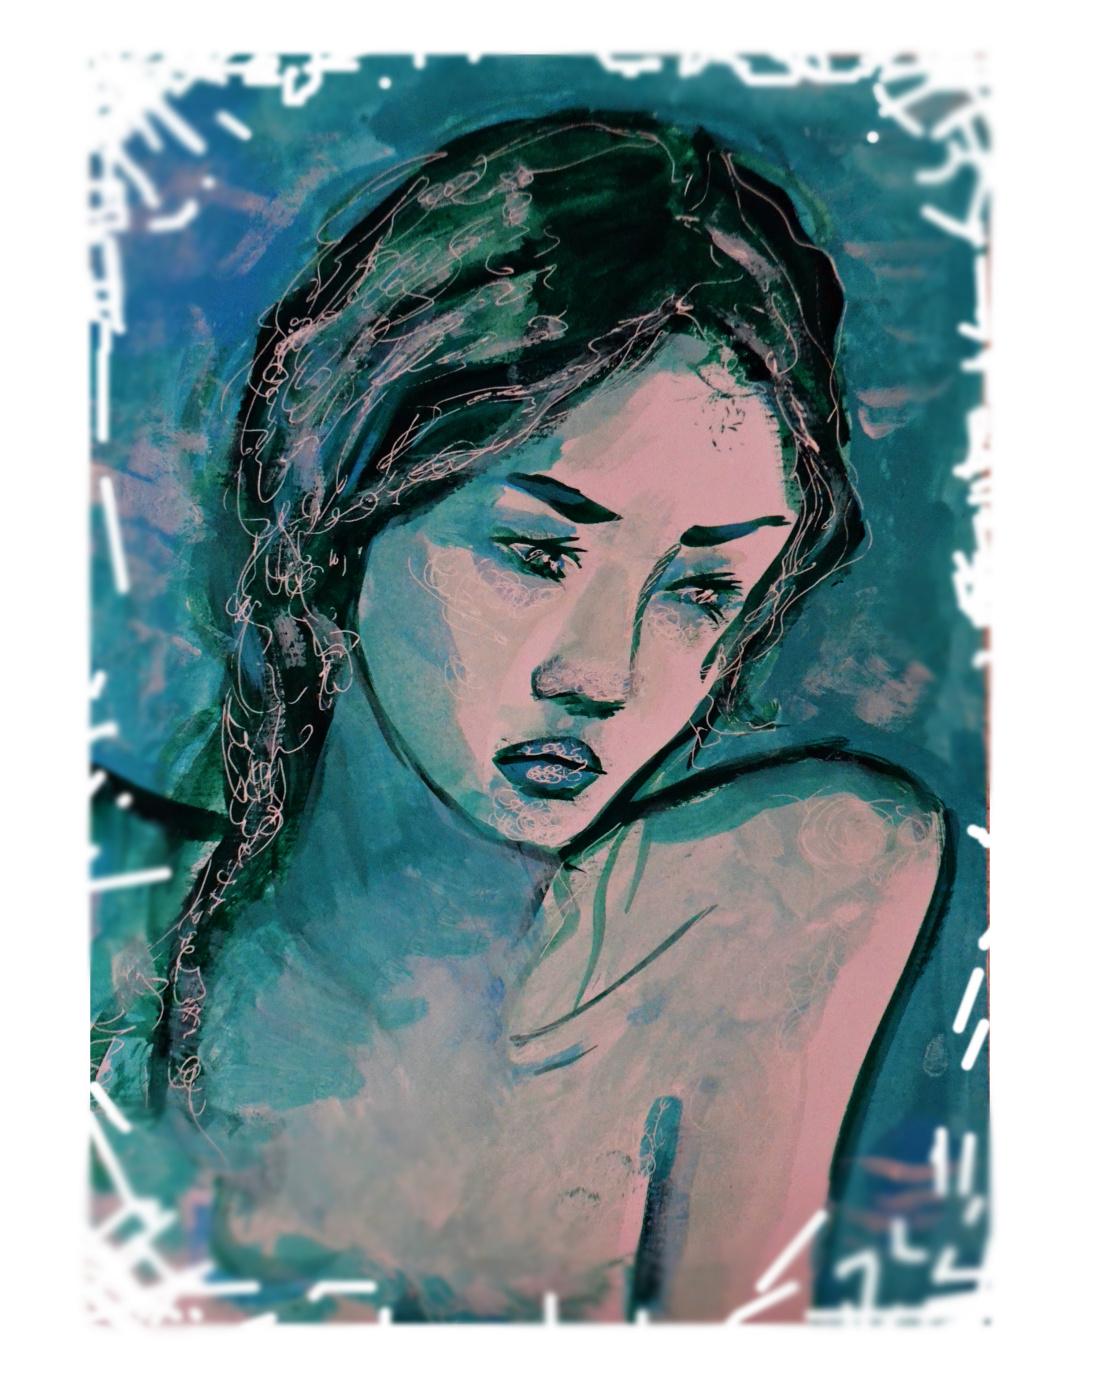 Елена Валерьевна Ведяева. Blue girl